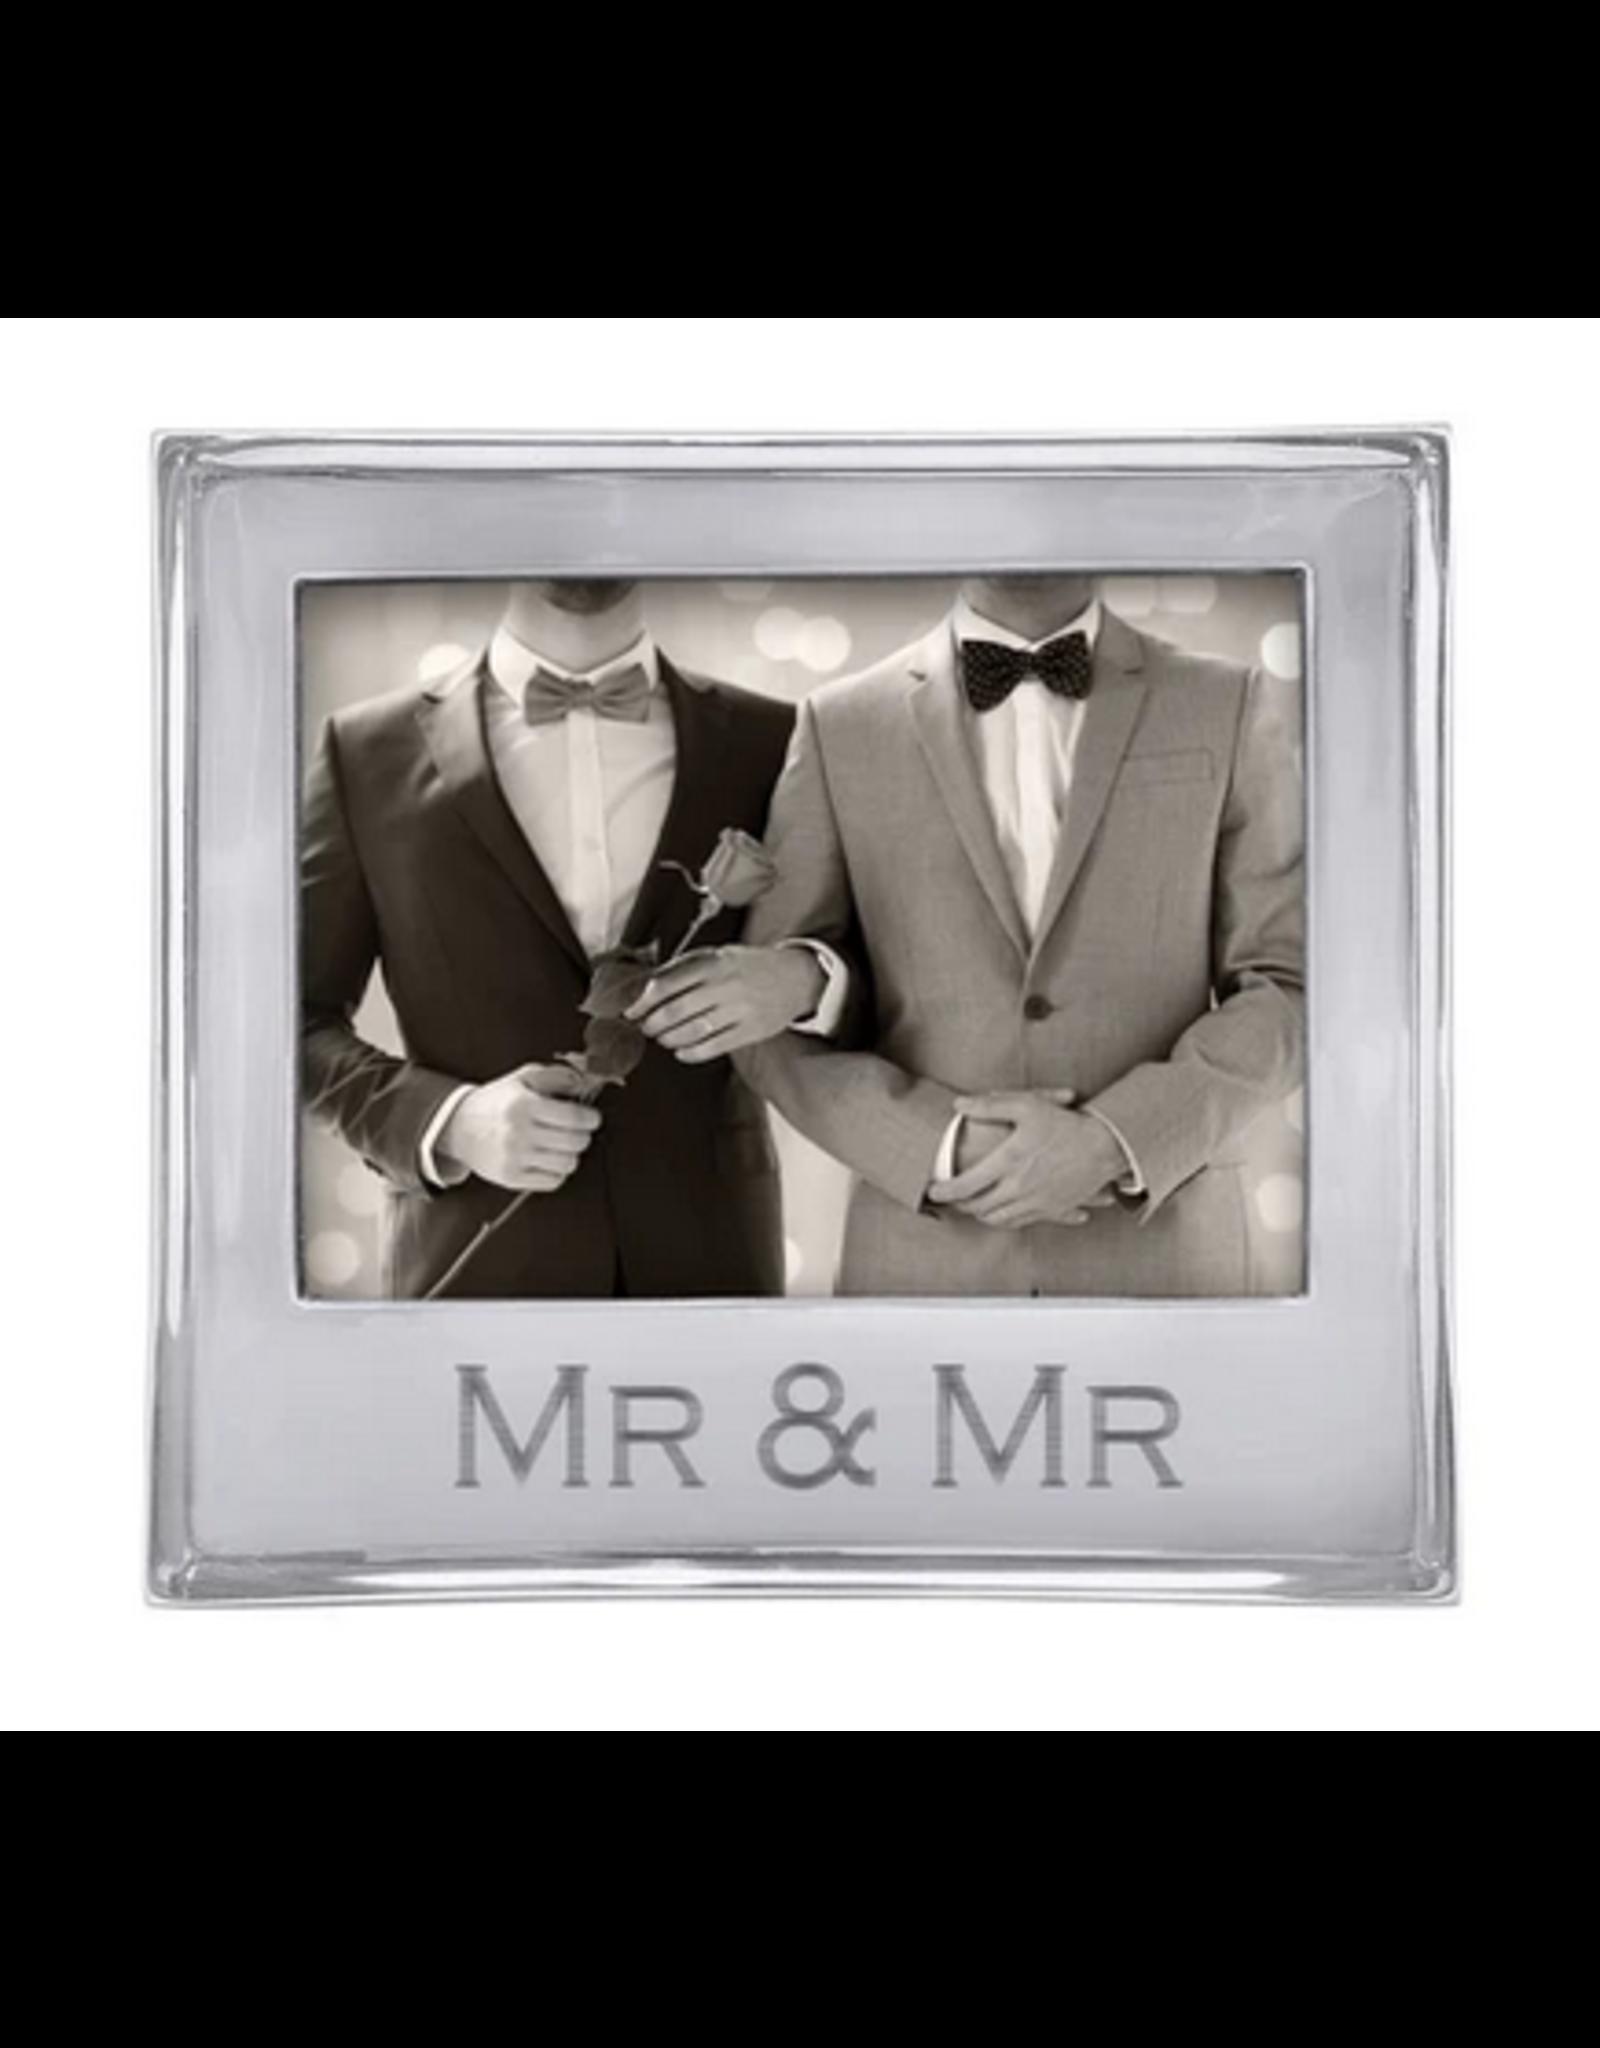 Mariposa Mr. & Mr. Signature 5x7 Frame